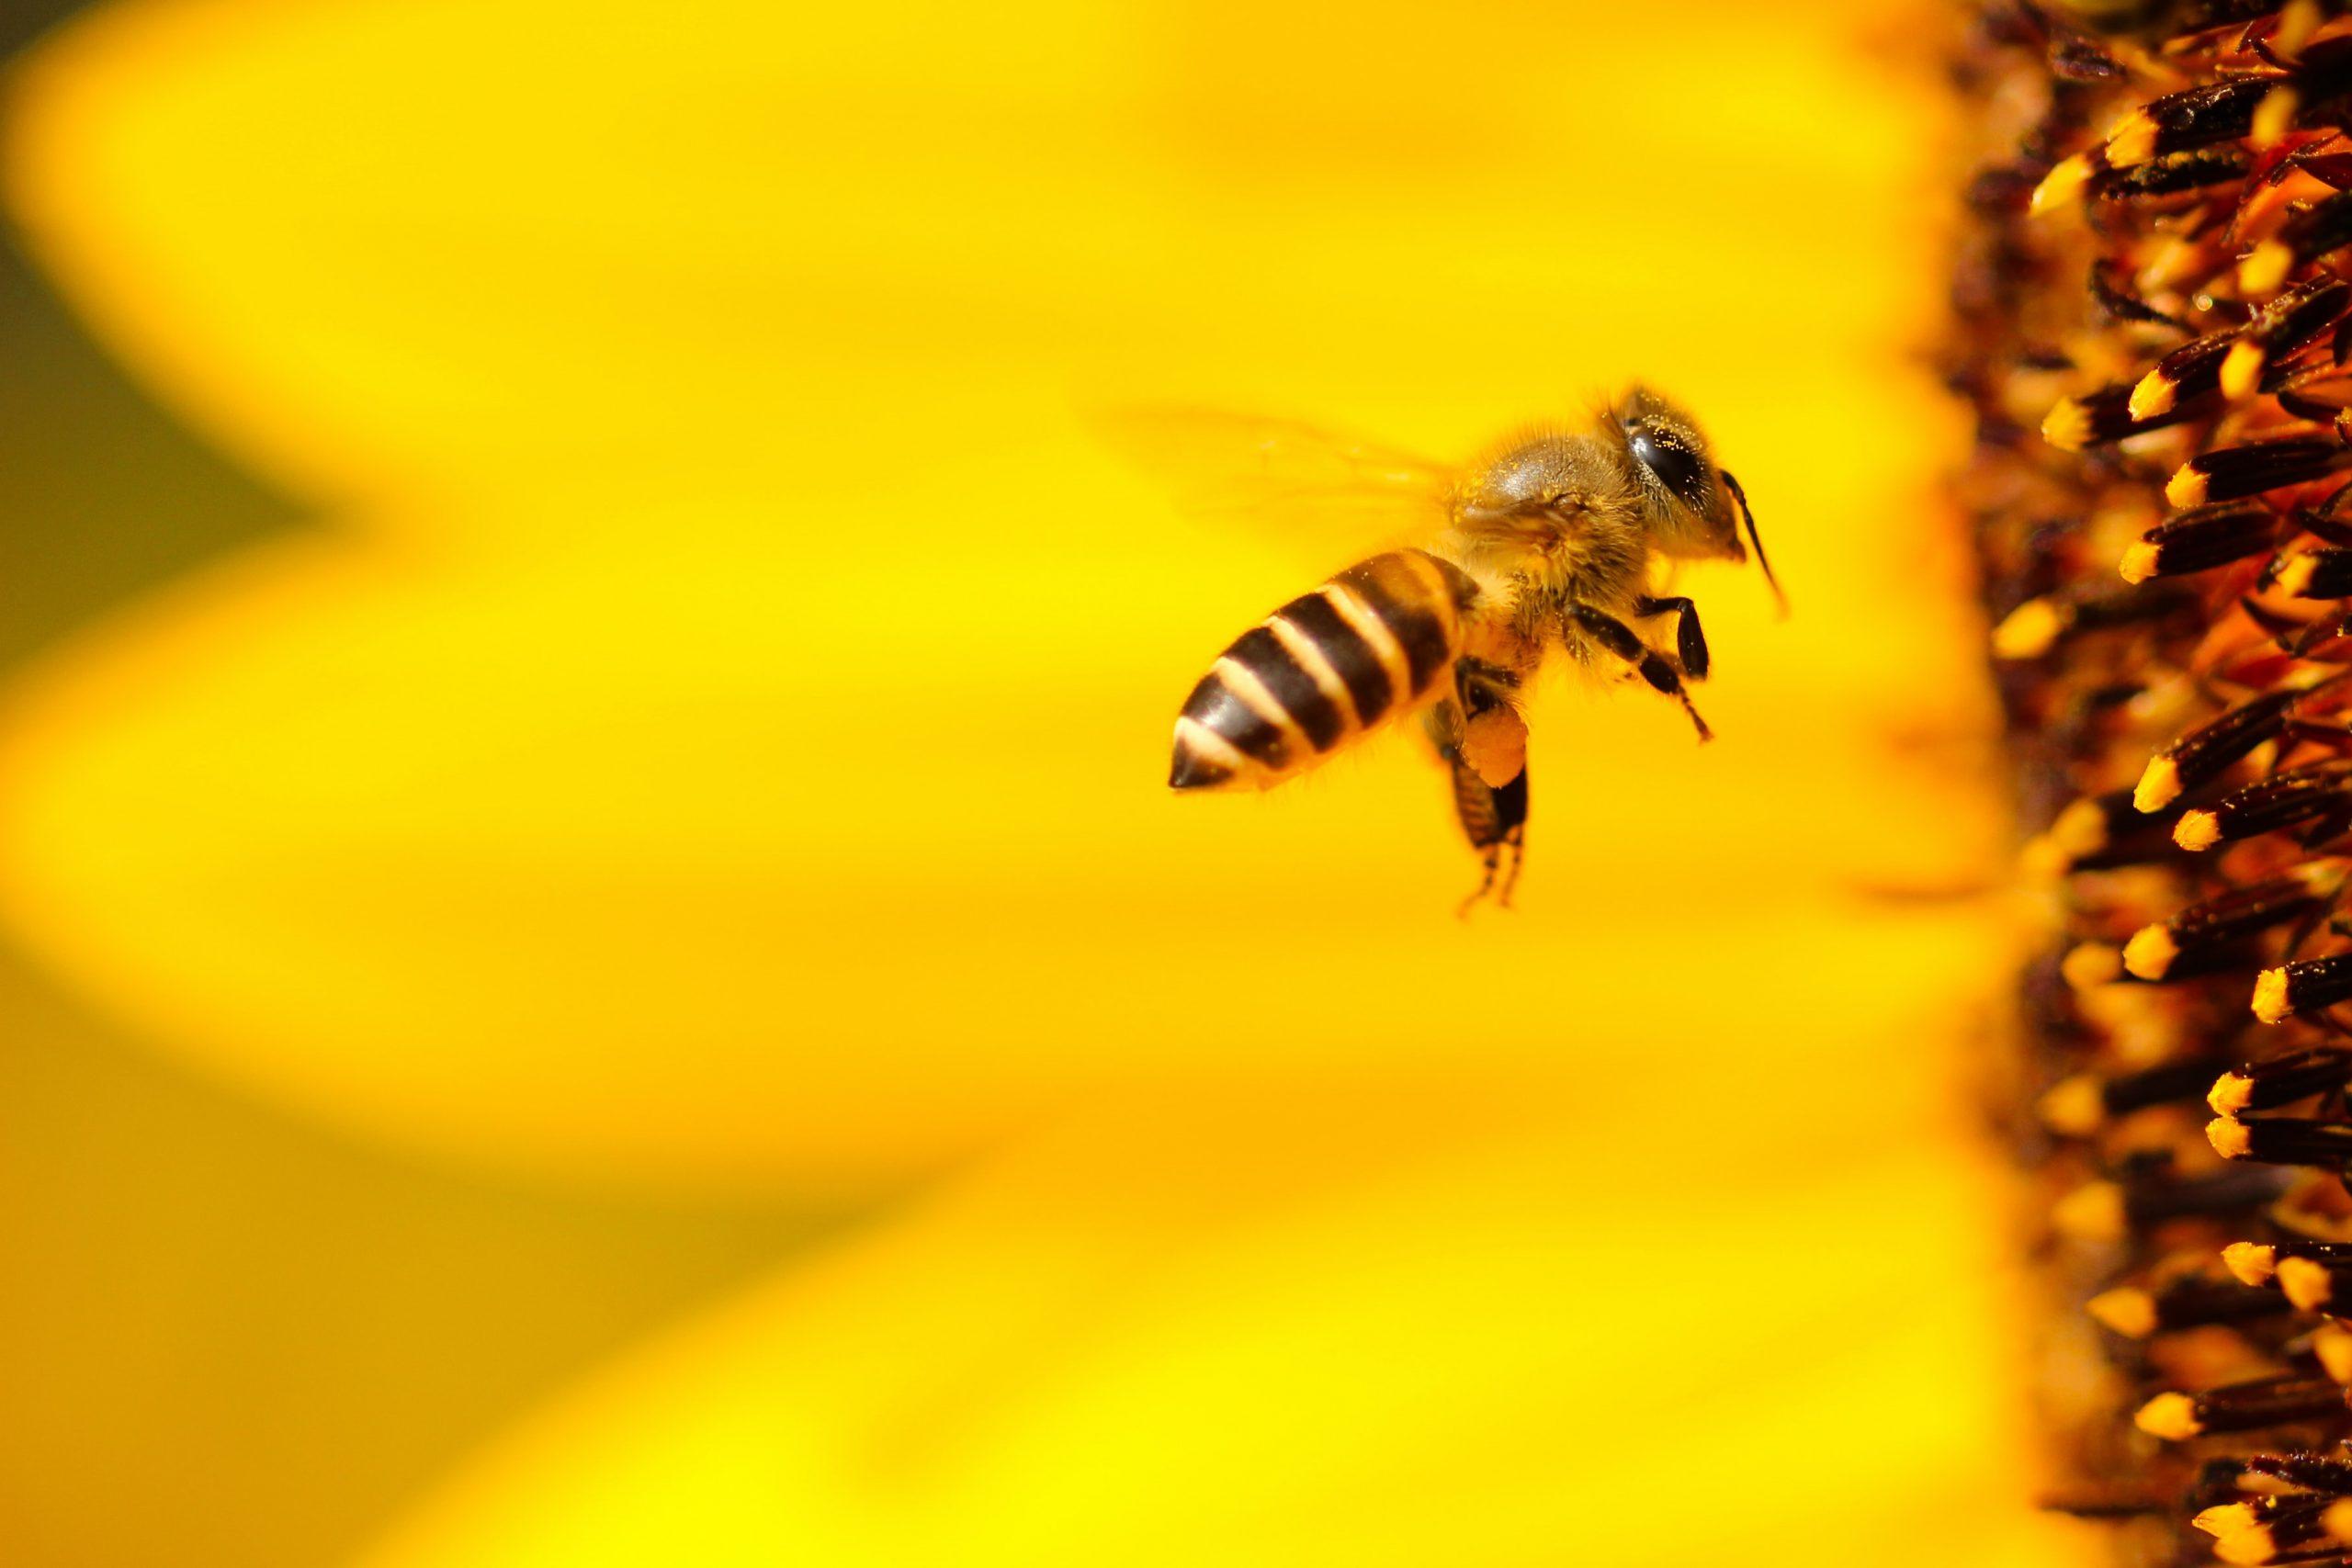 A honeybee approaches the center of a yellow flower